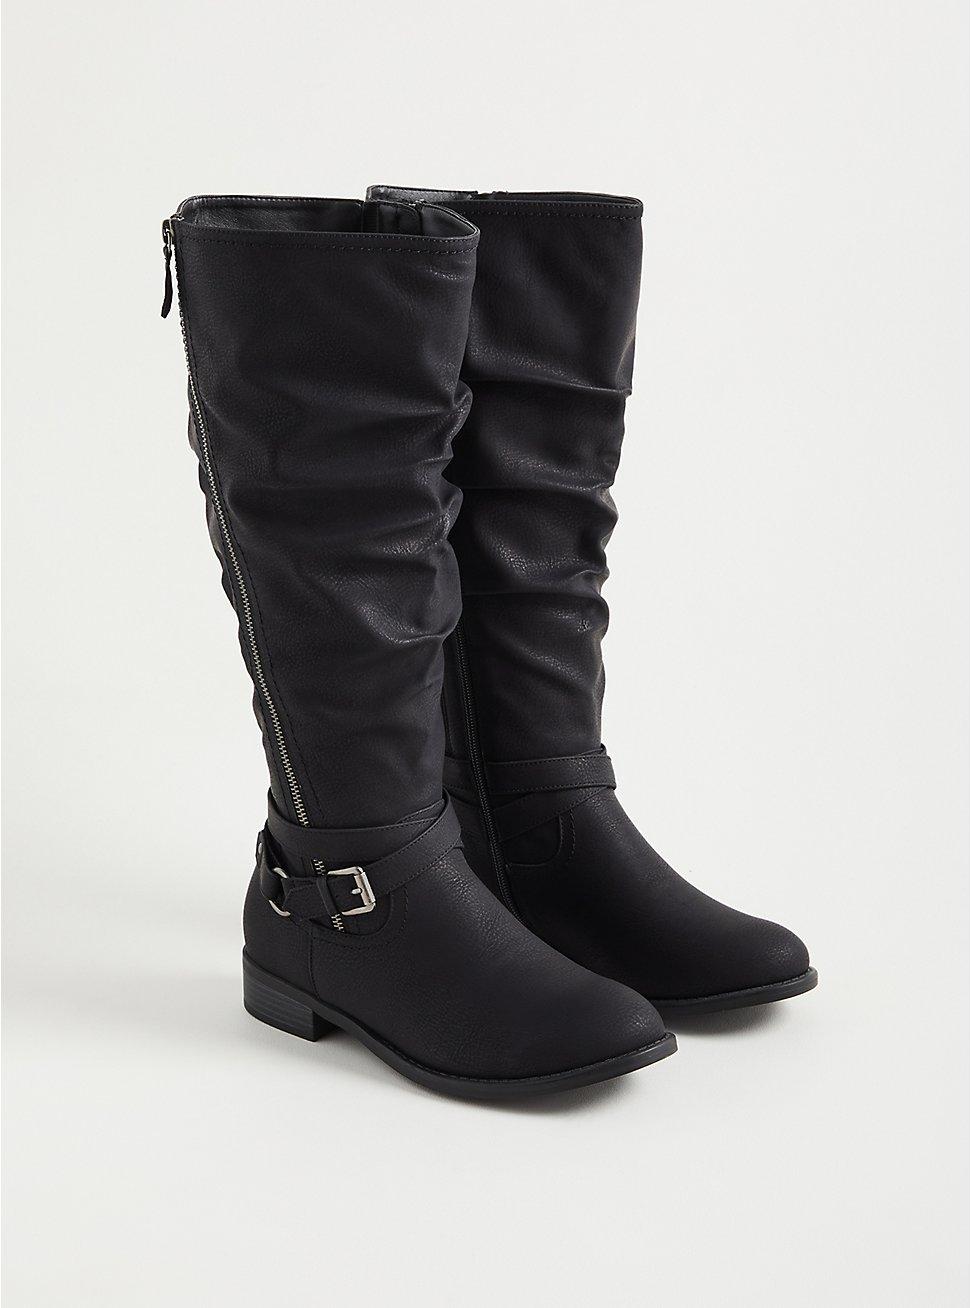 Plus Size Side Zip Knee Boot - Black Oil Suede (WW), BLACK, hi-res